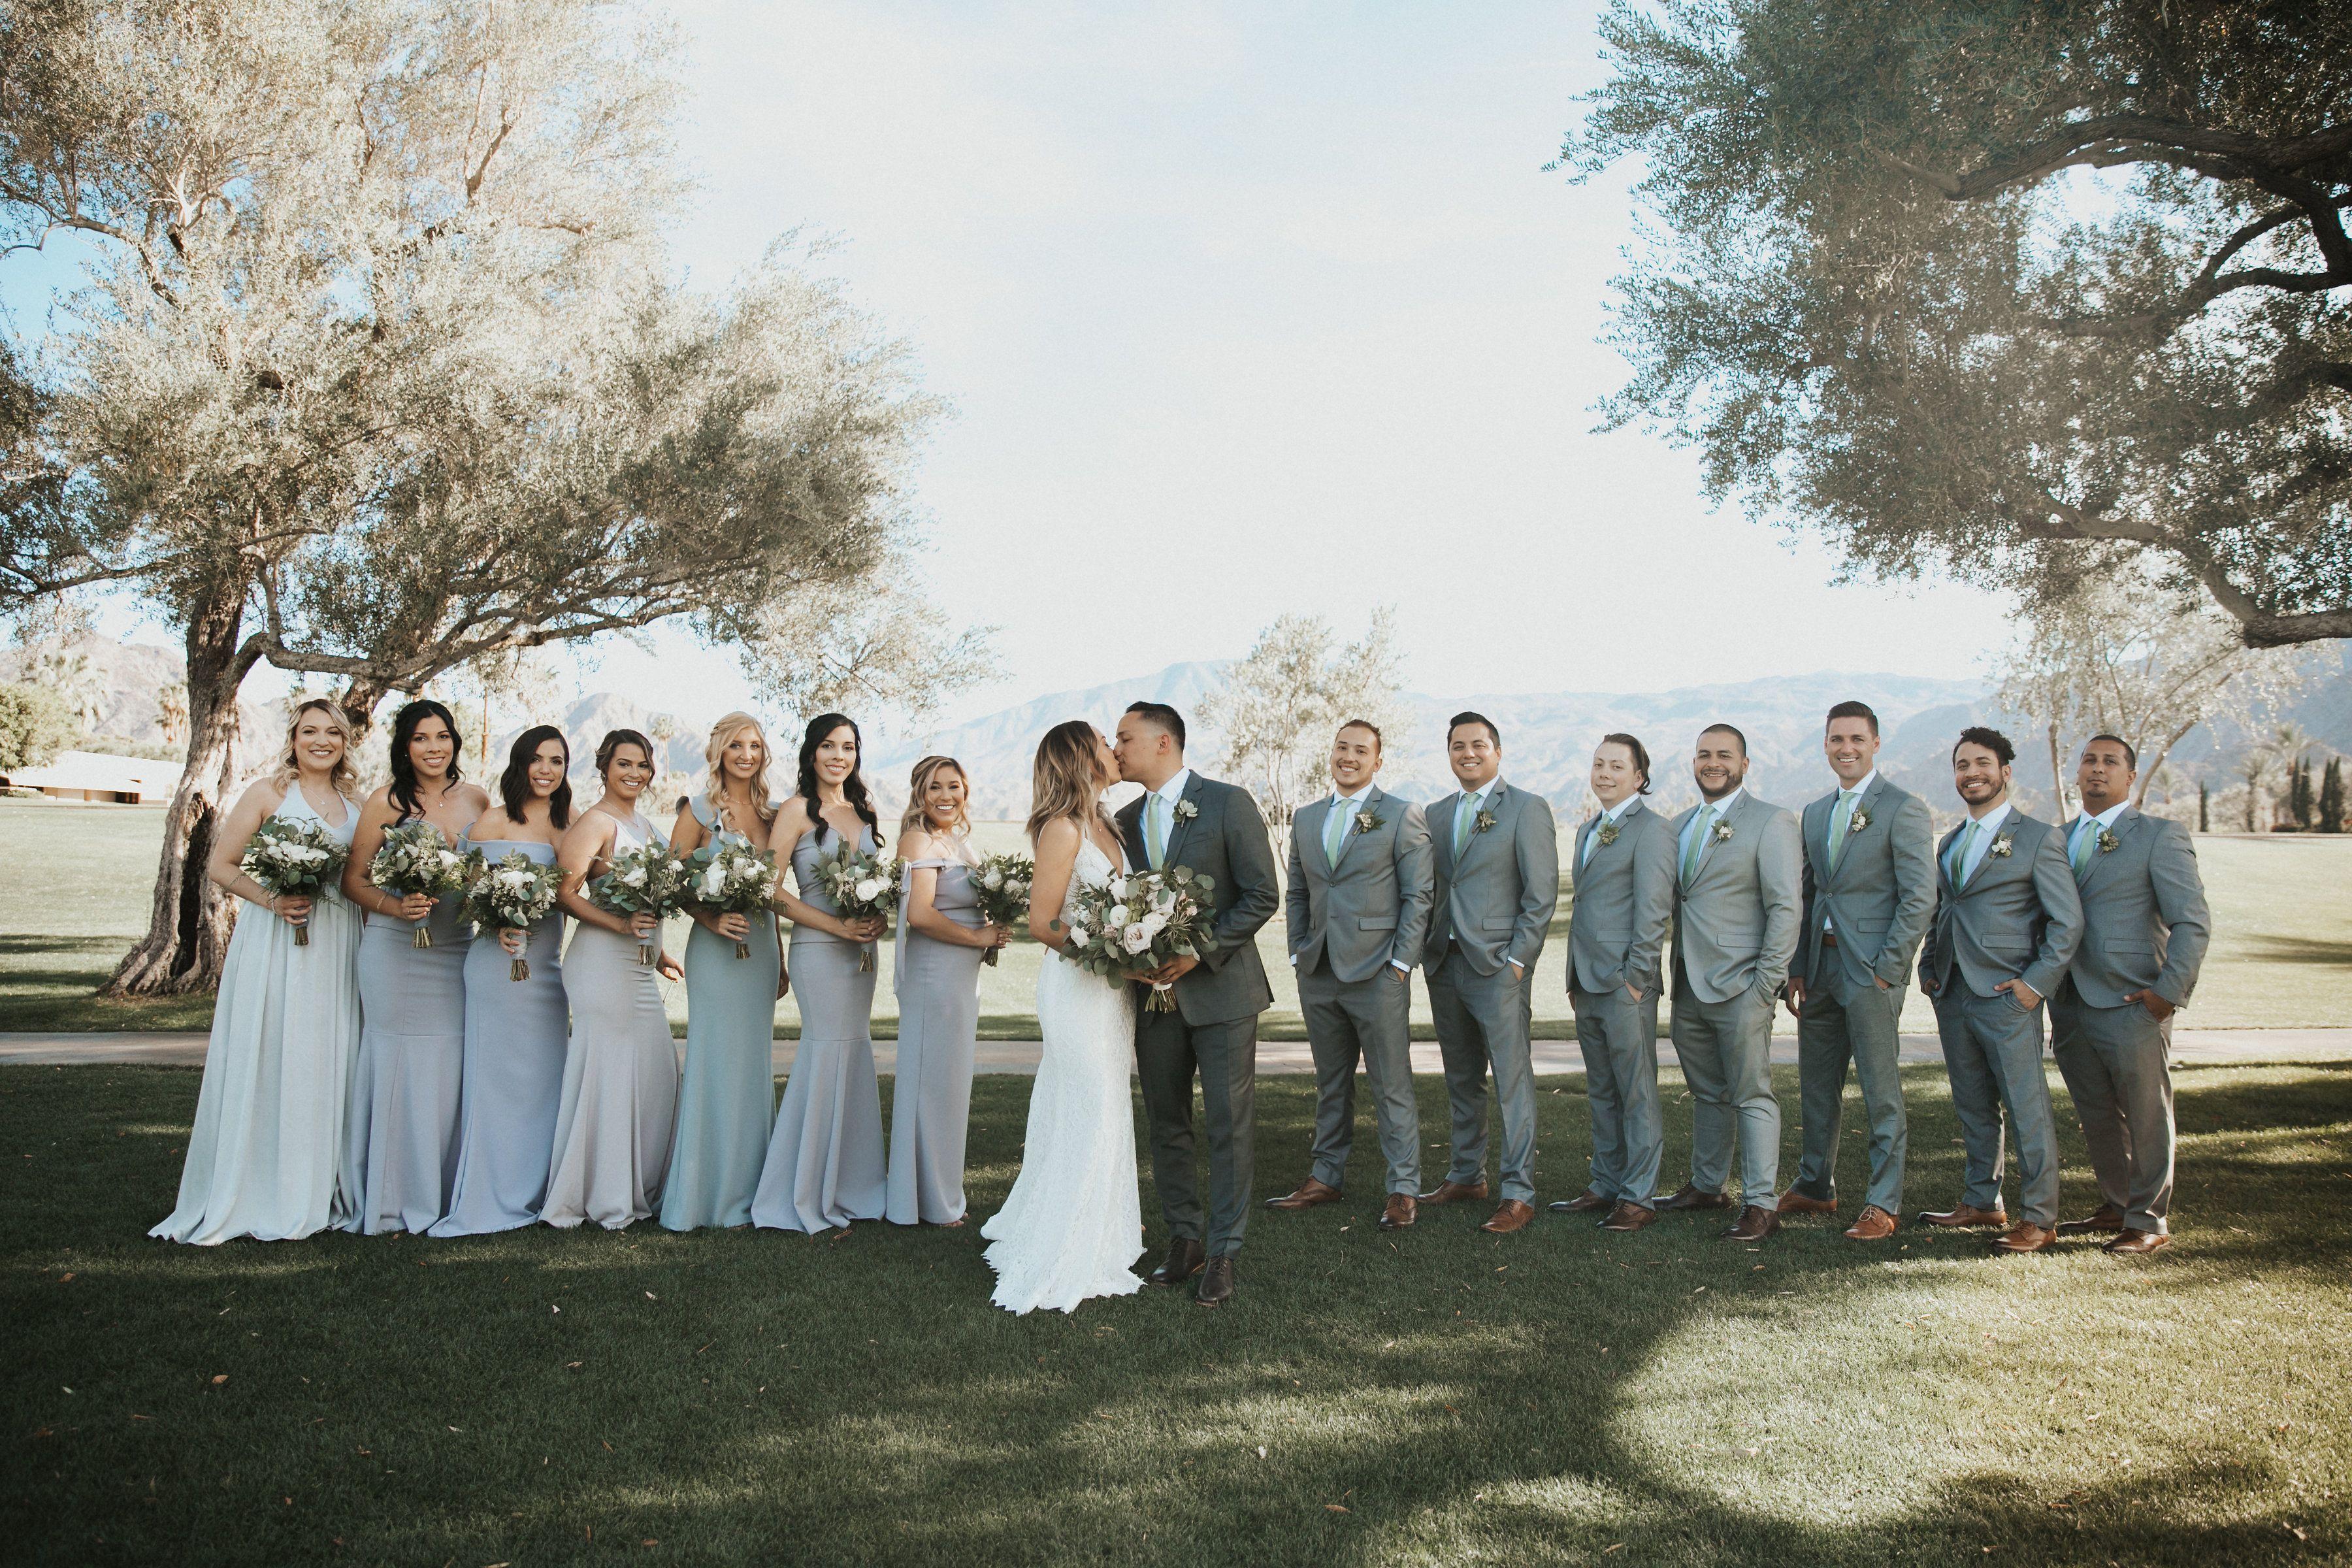 La Quinta Country Club Pure Lavish Events Southern California Wedding Planner Oc